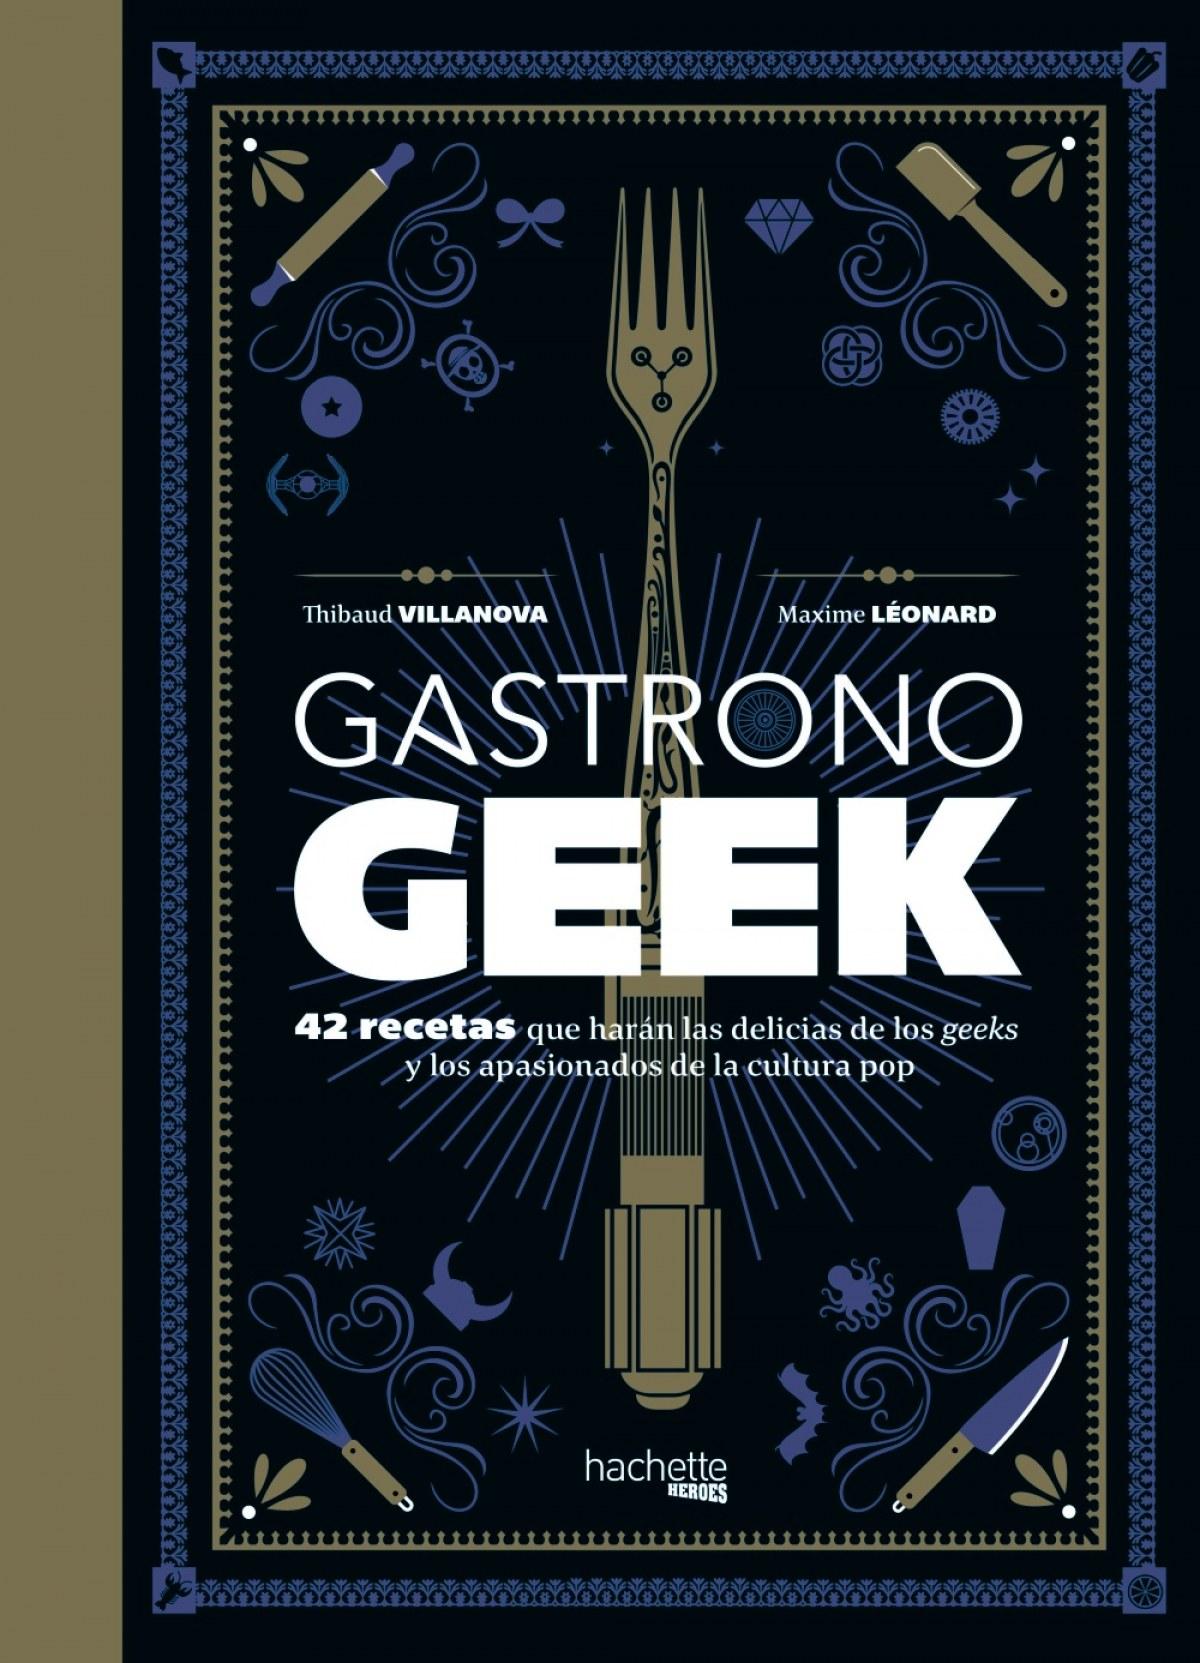 Gastronogeek 9788416857470